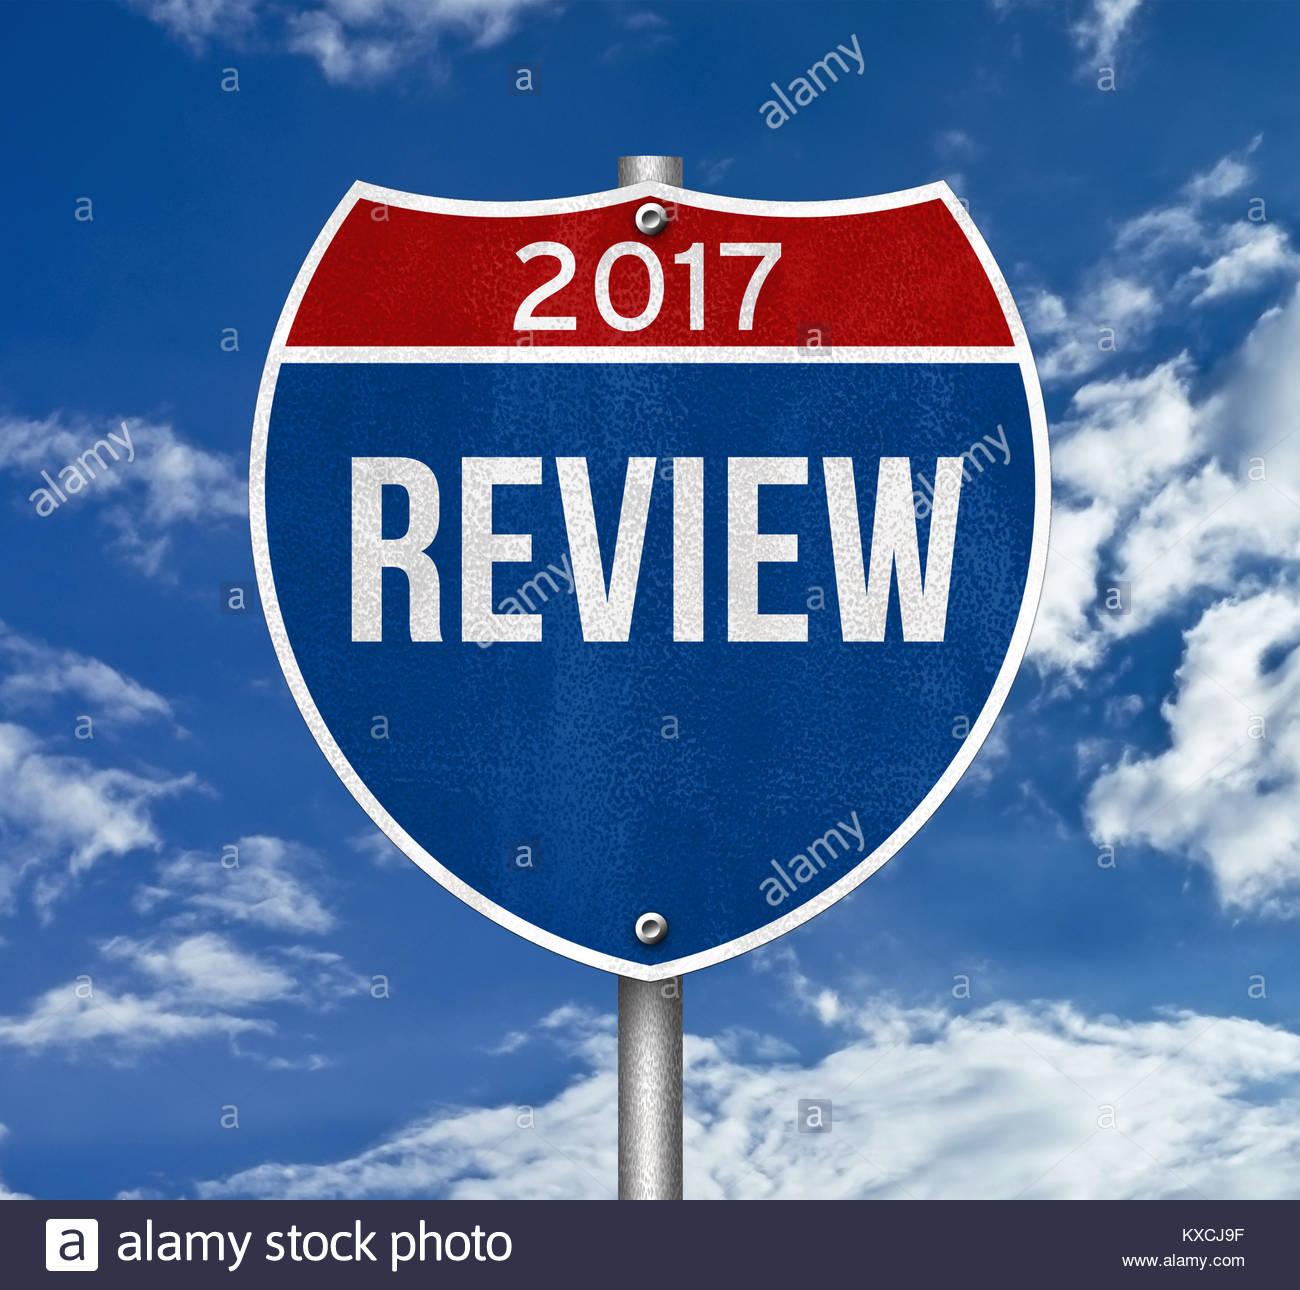 Revisión 2017 Imagen De Stock